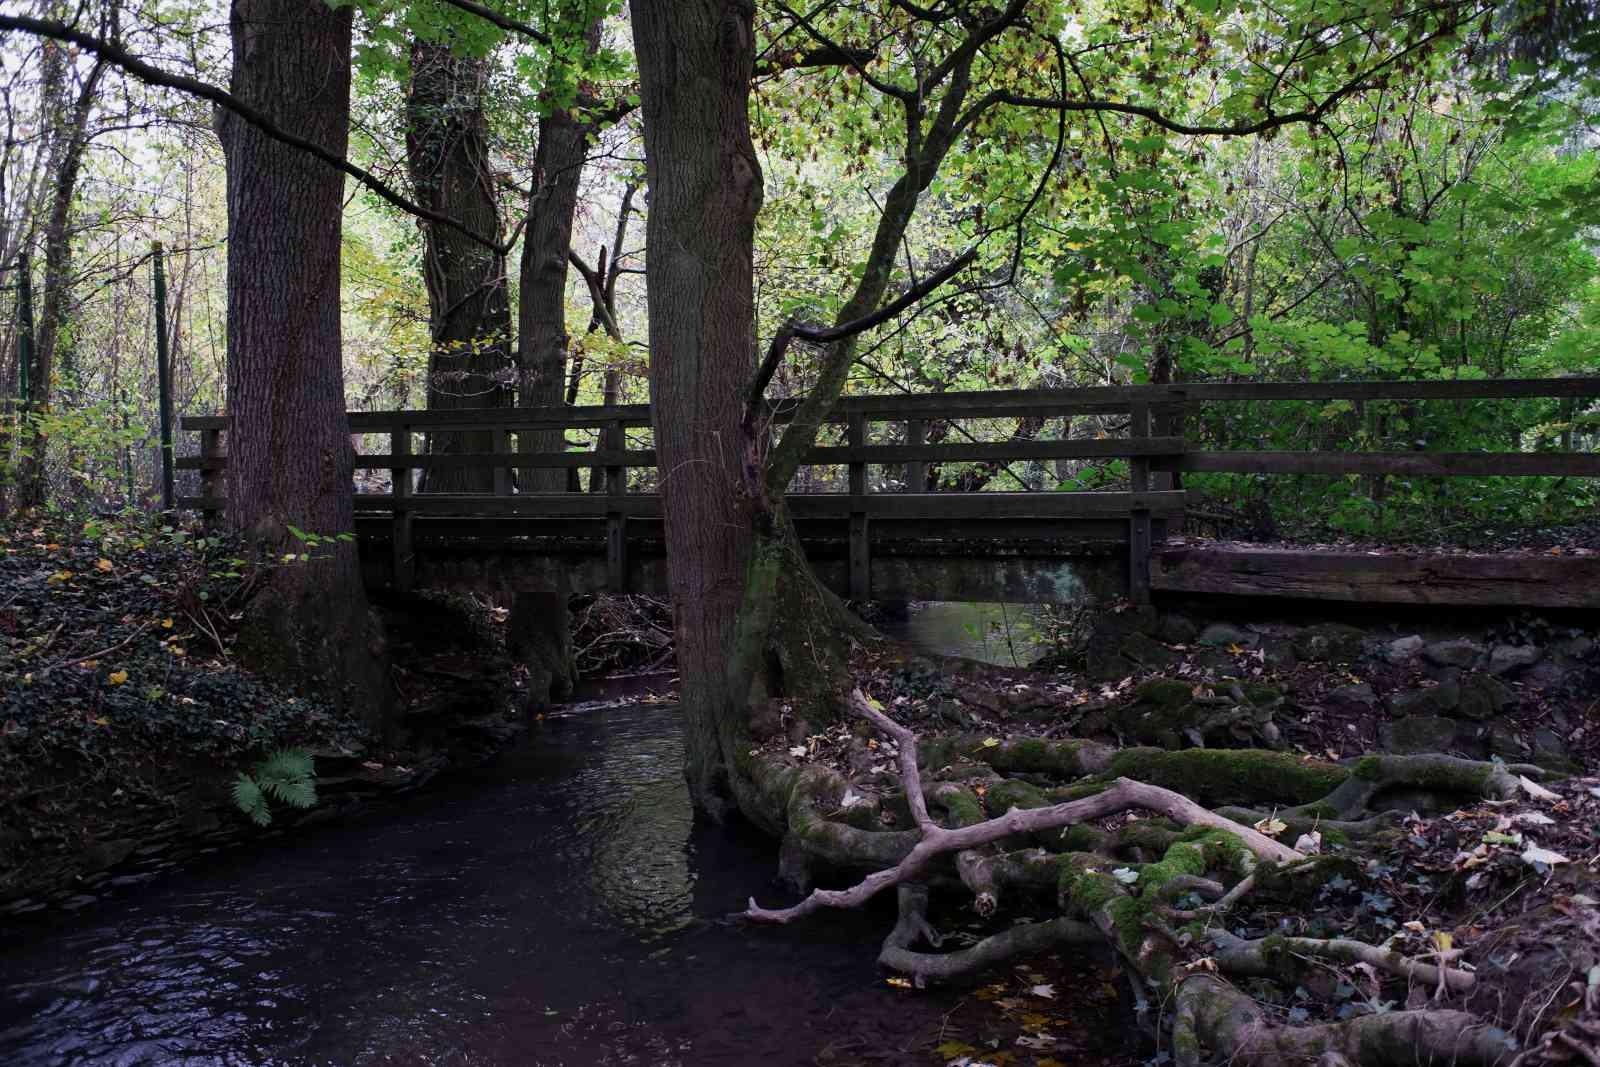 Brücke über die Düssel